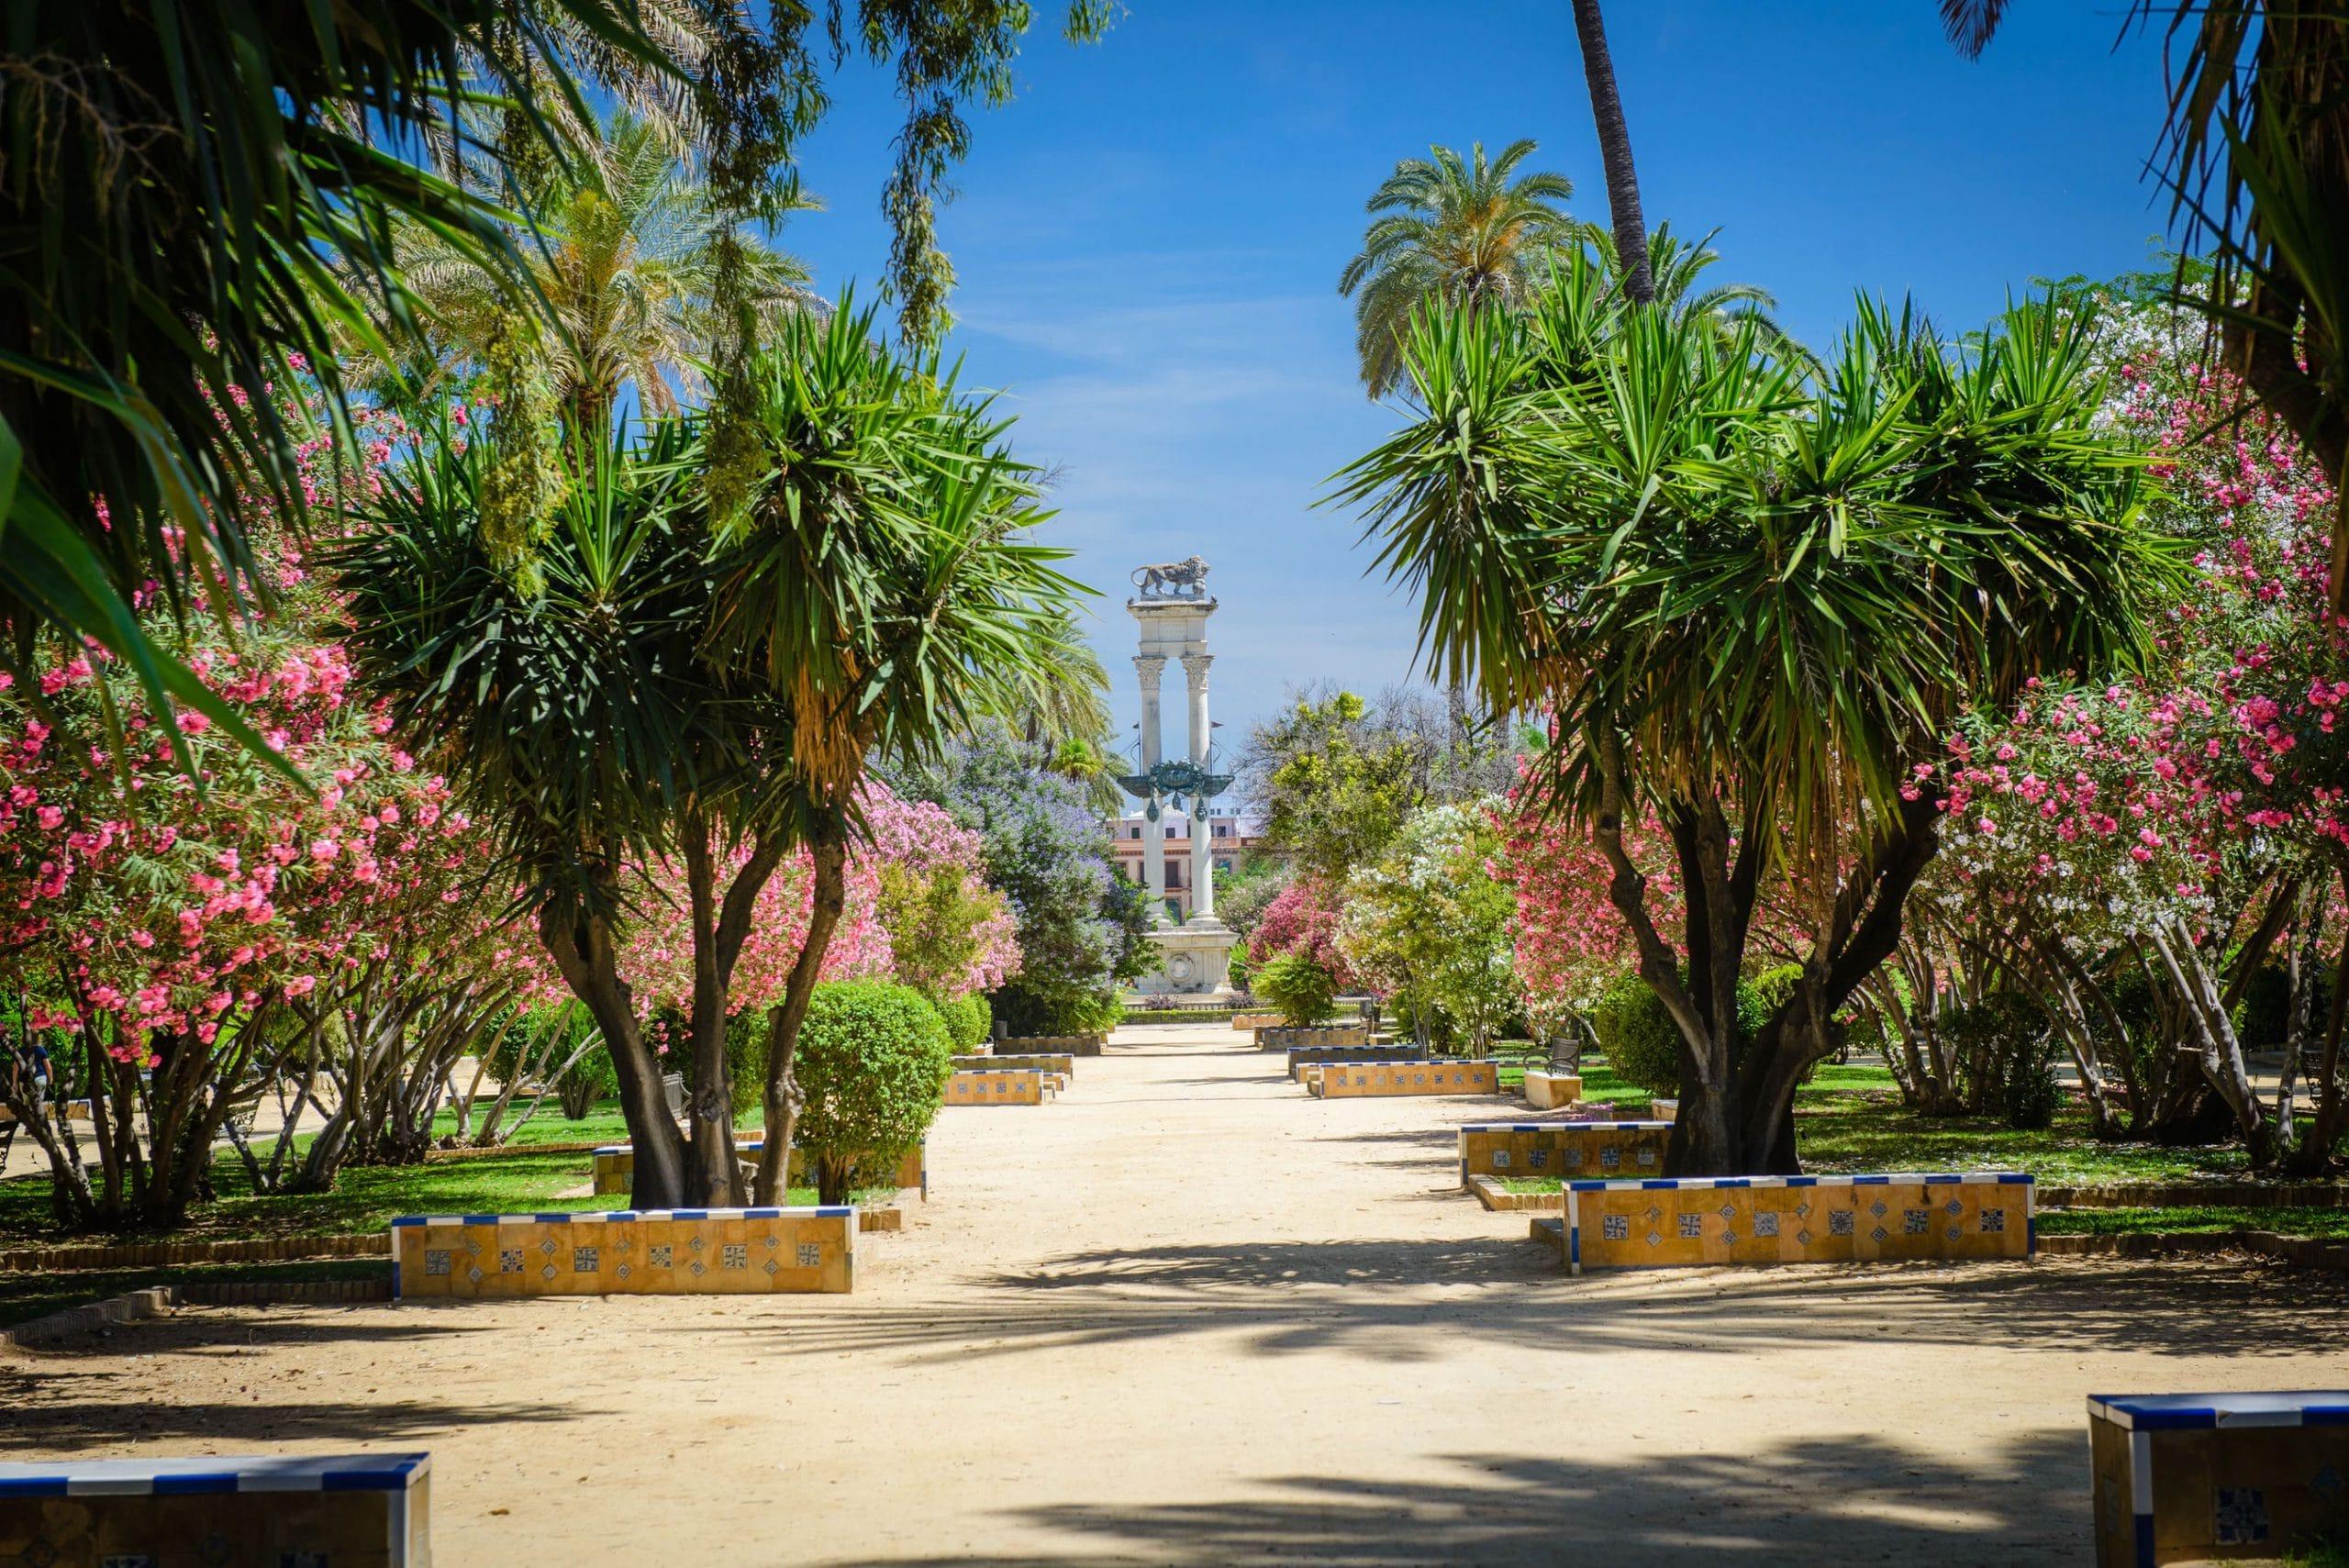 Entretien jardin Saint-Etienne